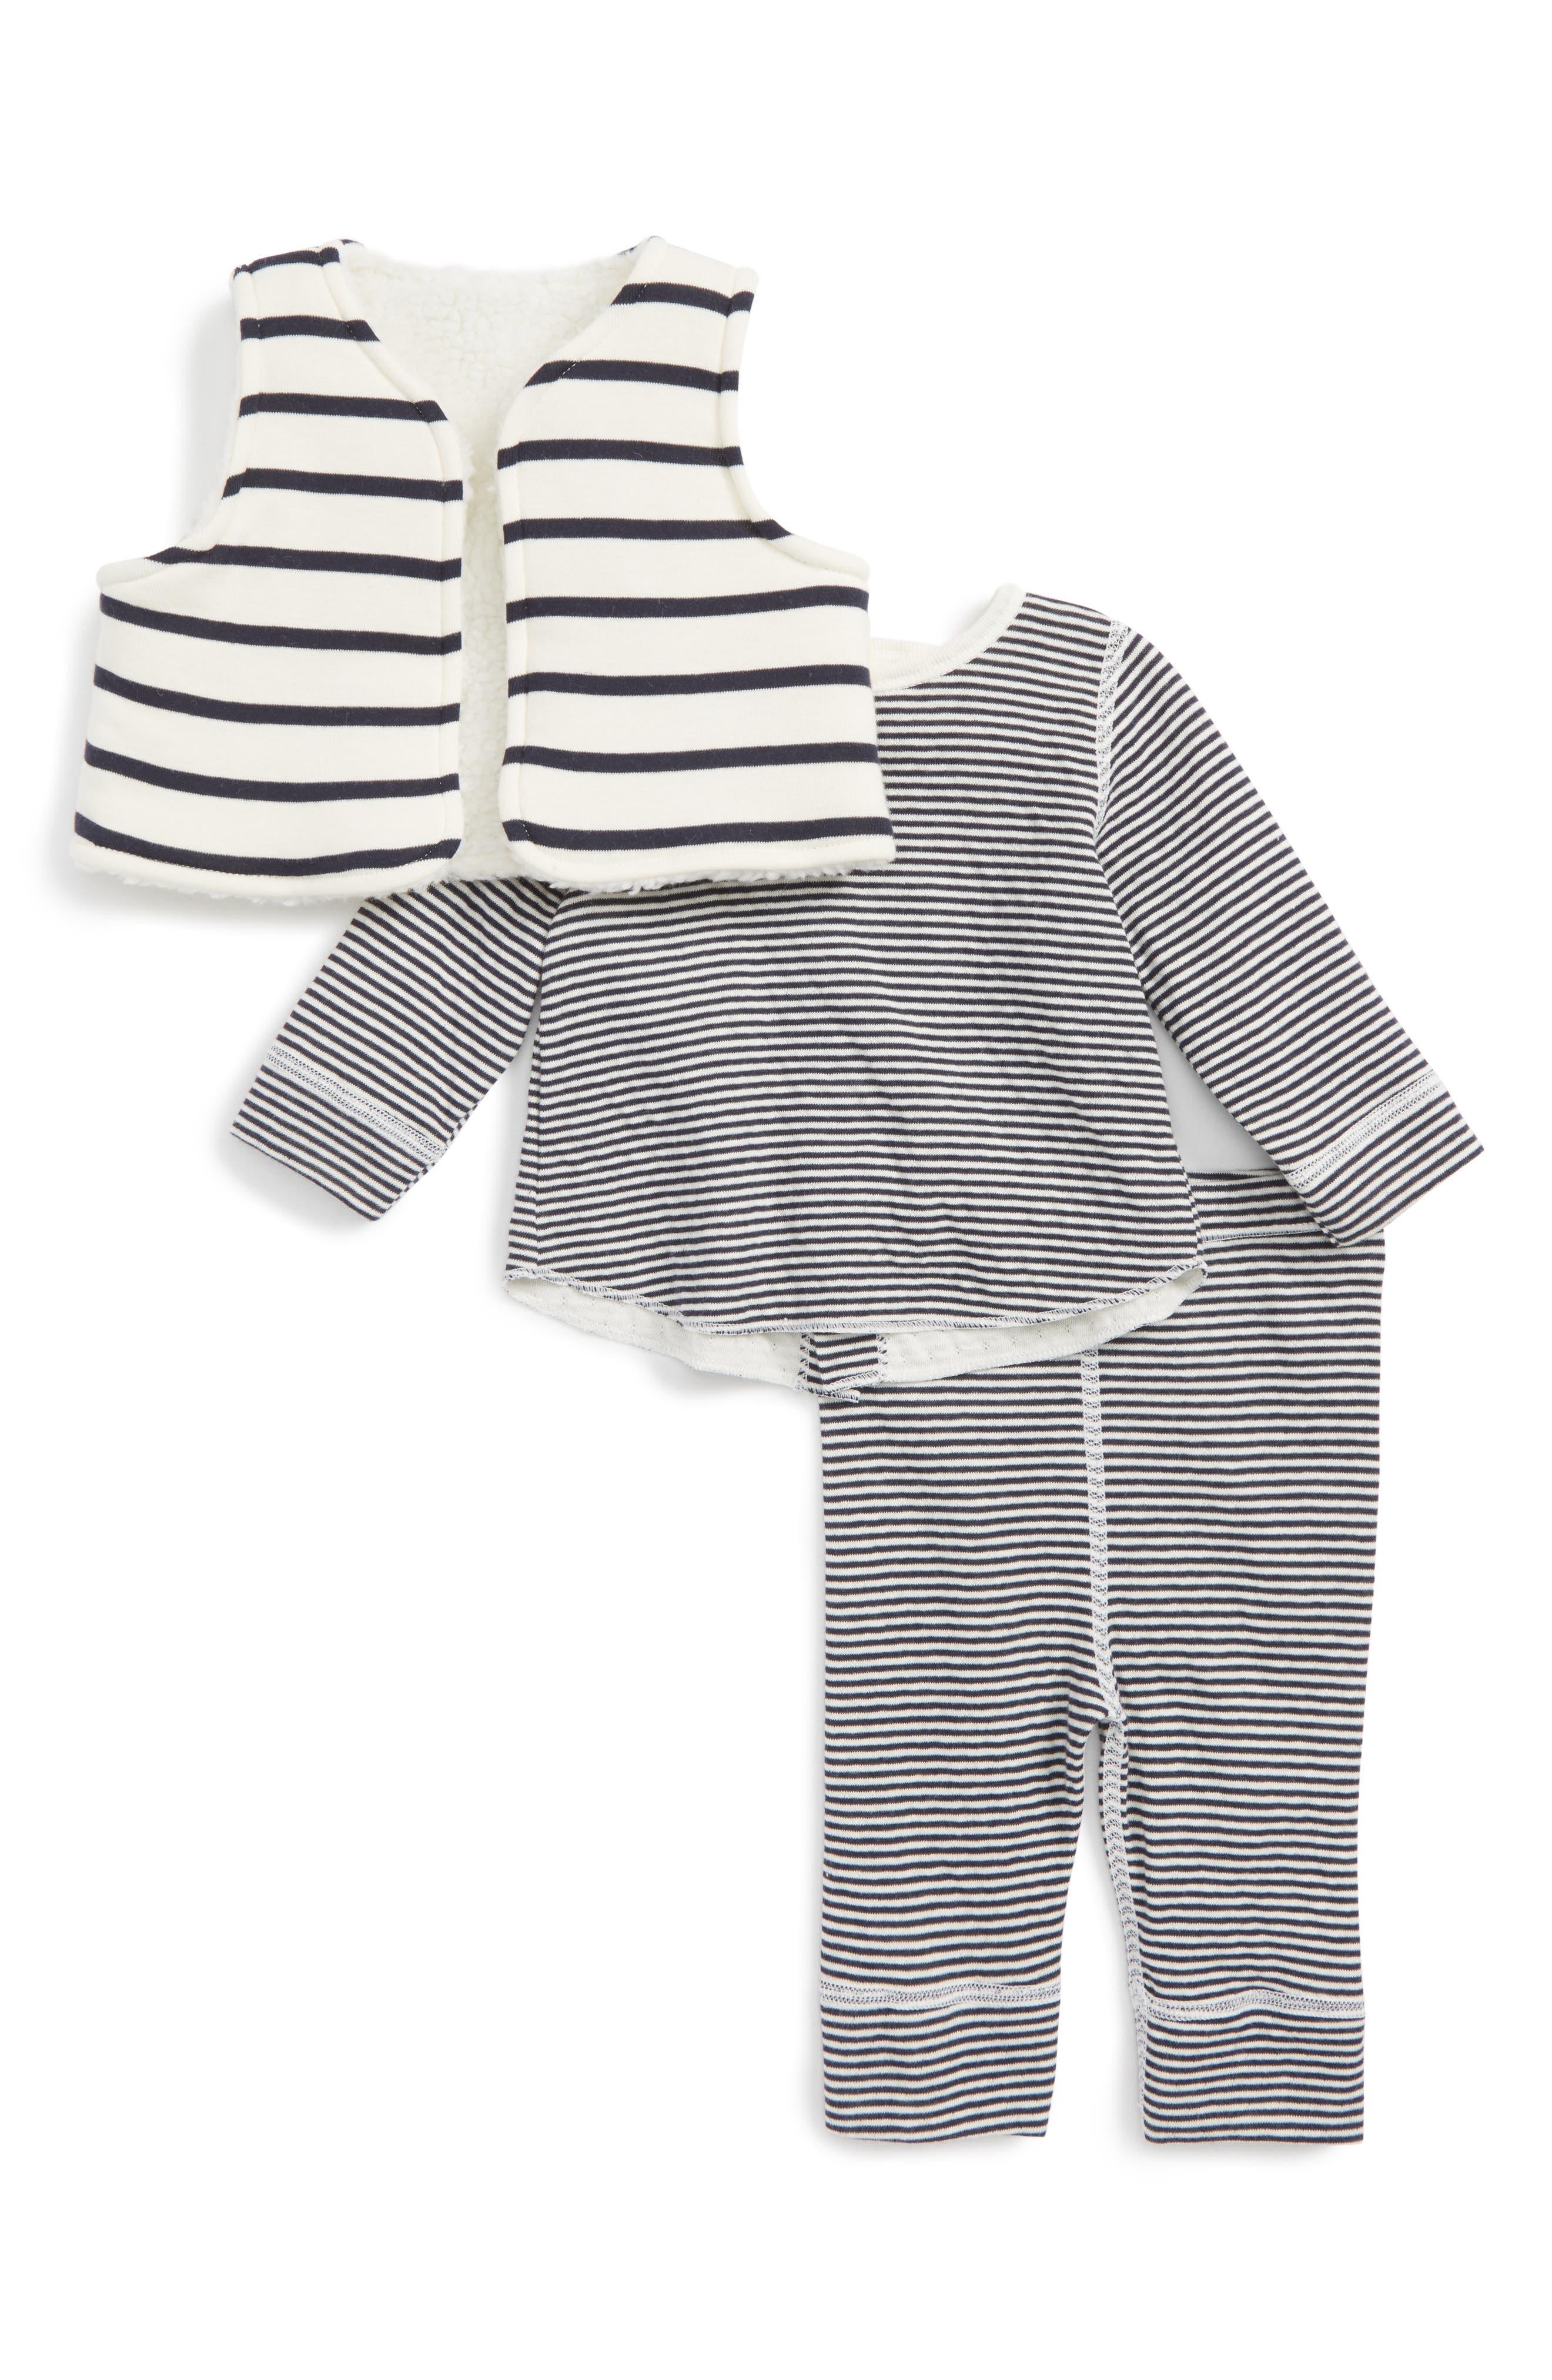 Alternate Image 1 Selected - Petit Bateau Stripe Vest, Tee & Leggings Set (Baby)